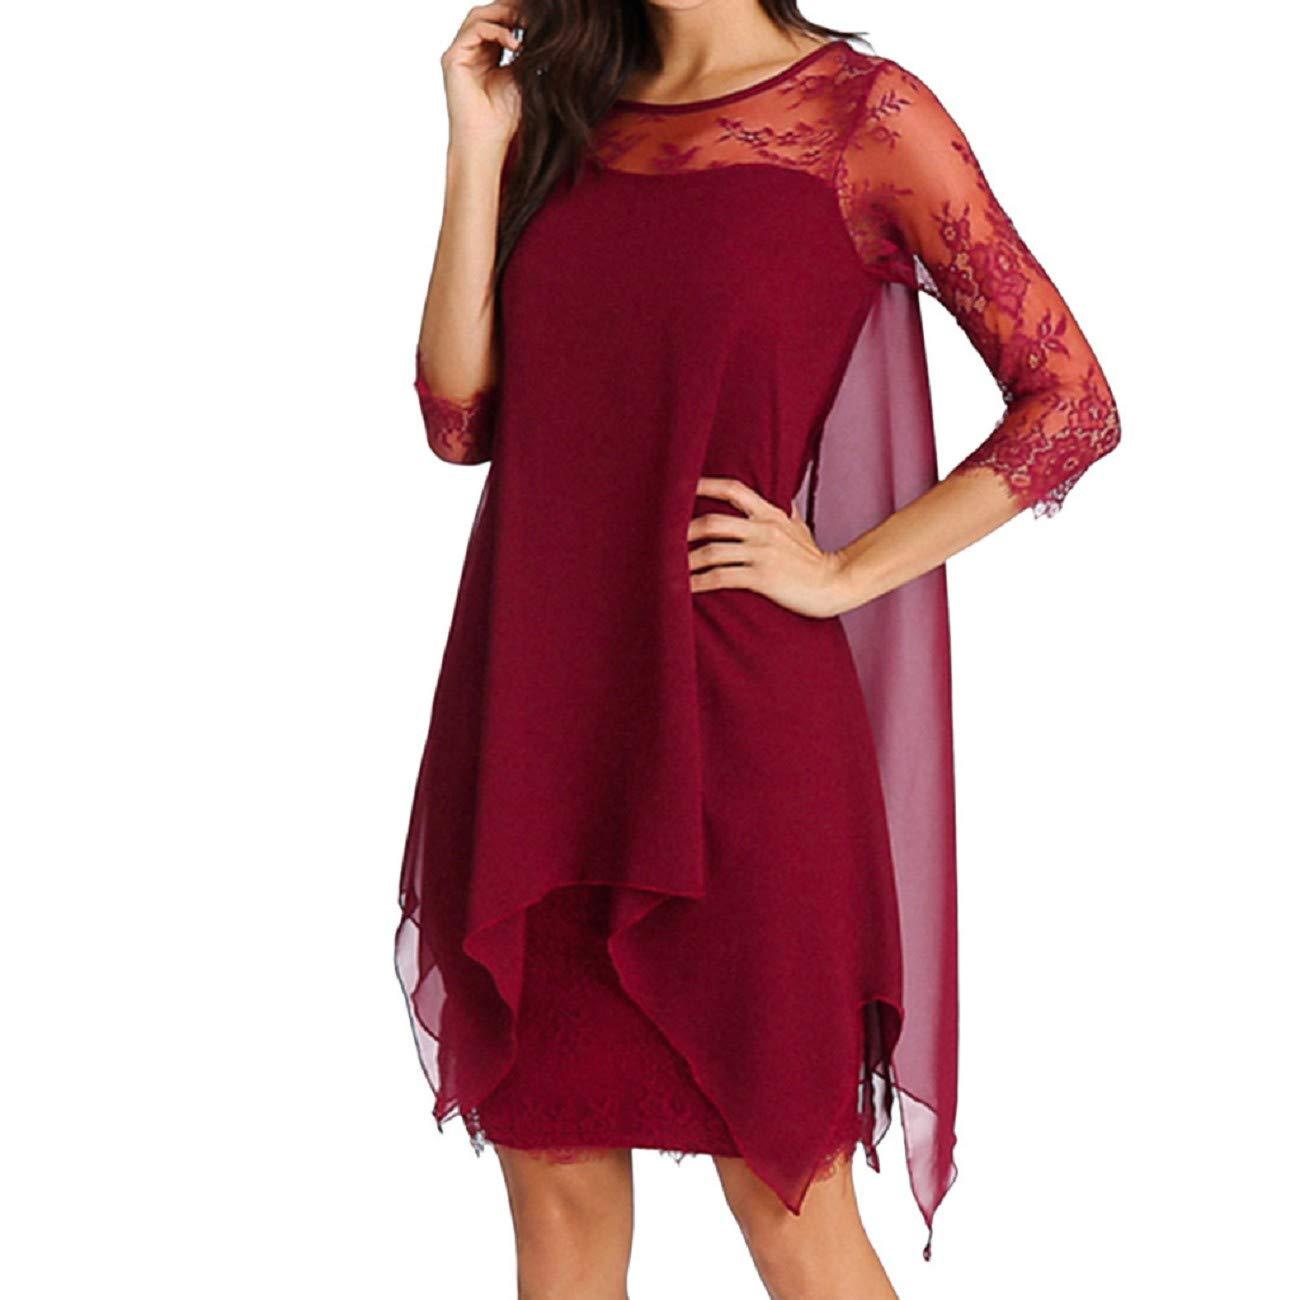 8d2d4479db93 Amazon.com: FAPIZI Women Solid O-Neck Asymmetrical Hem Lace Chiffon Long  Sleeve Casual Overlay Plus Size Mid Dress: Clothing